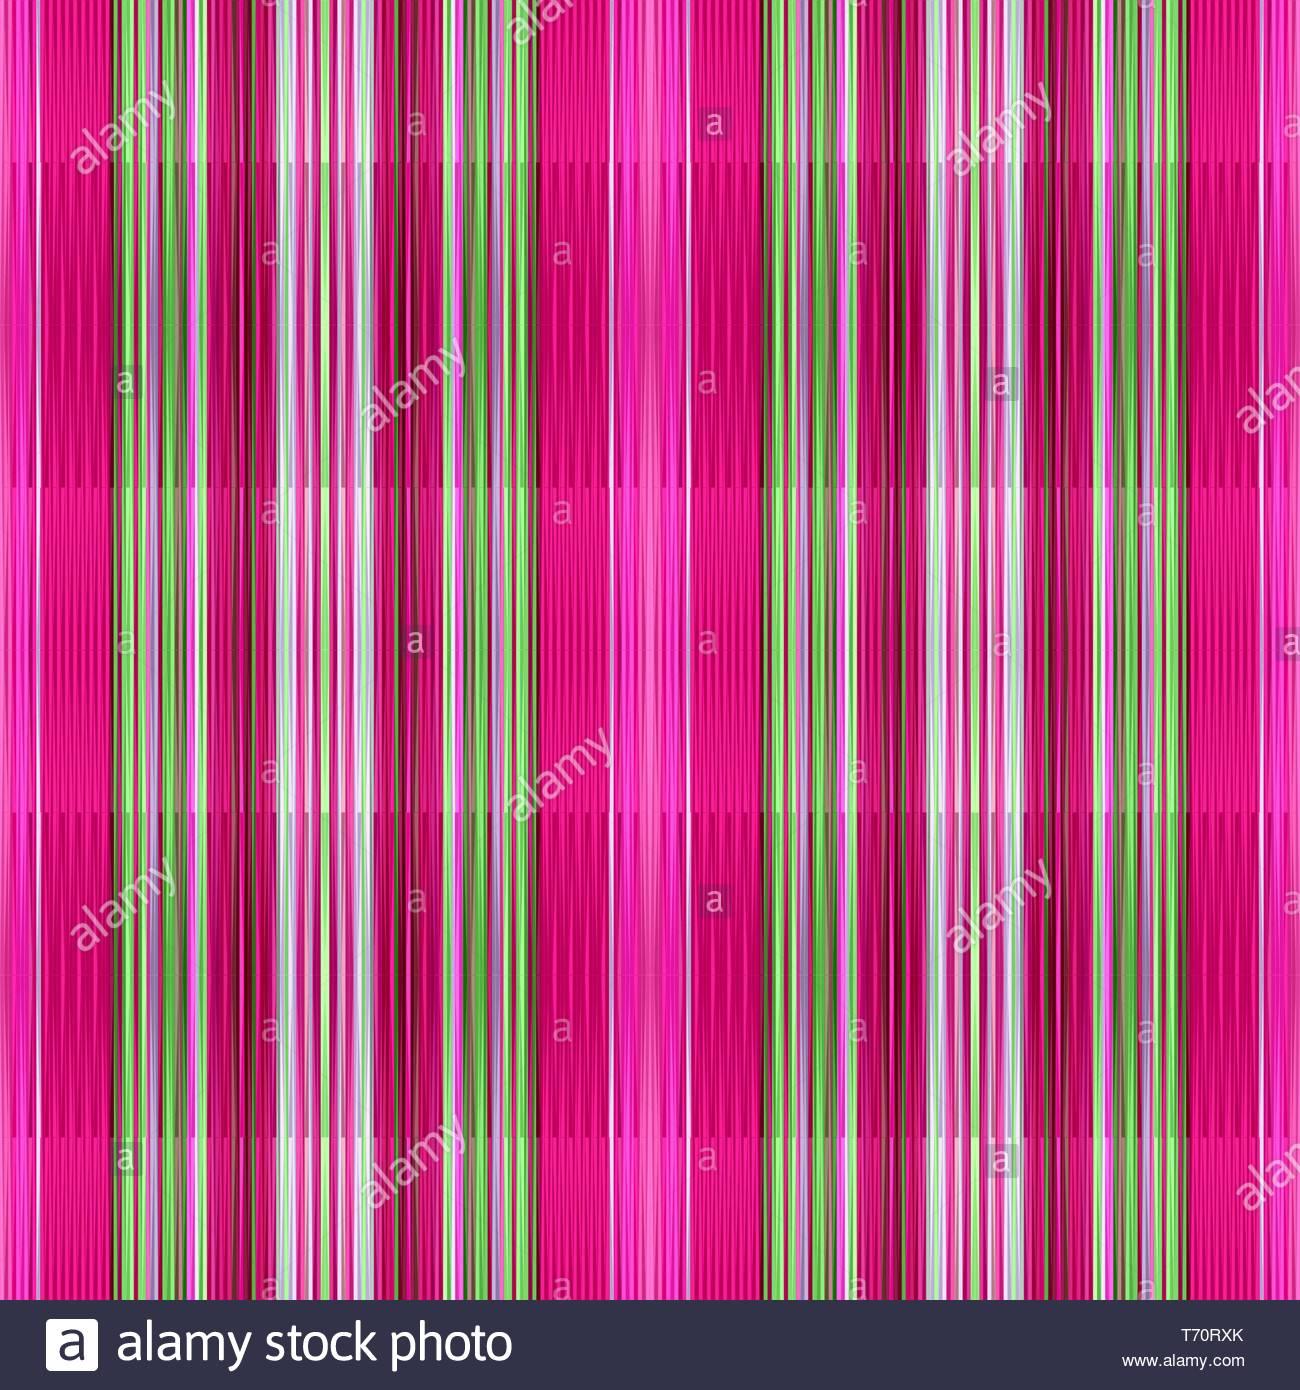 dark sea green ash gray and medium violet red color pattern 1300x1390